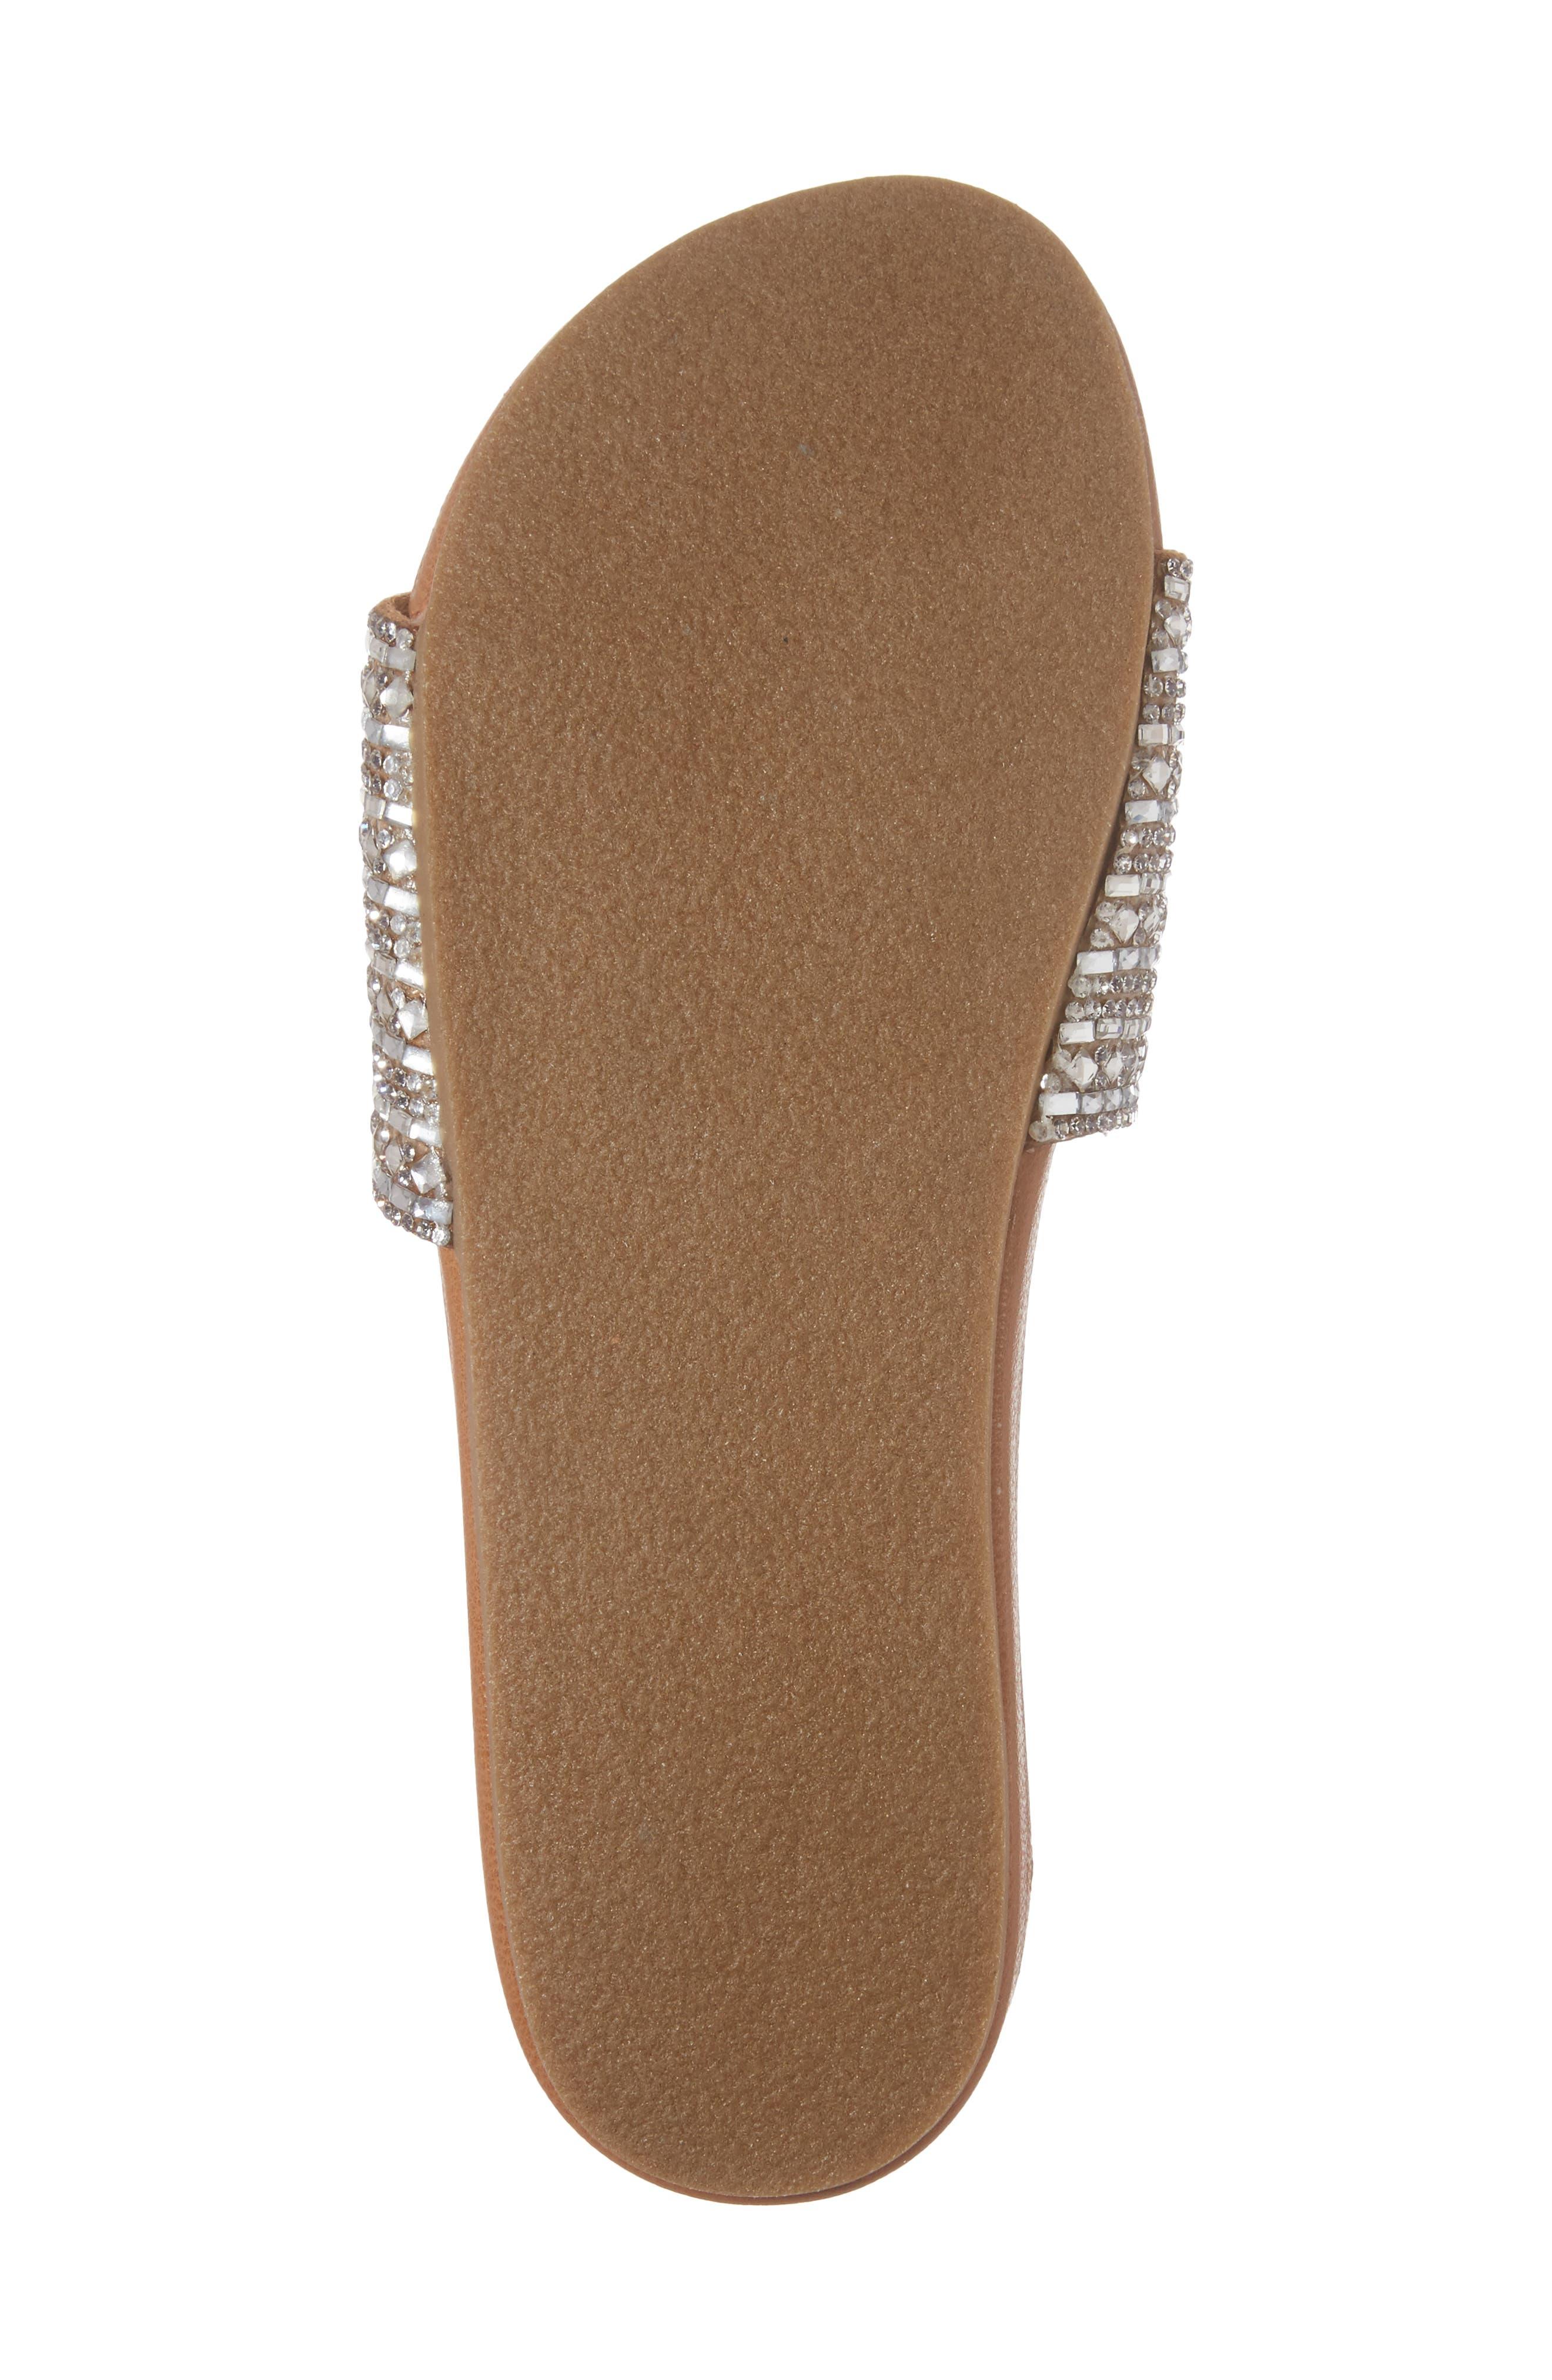 Dazzle Embellished Slide Sandal,                             Alternate thumbnail 6, color,                             Rhinestone